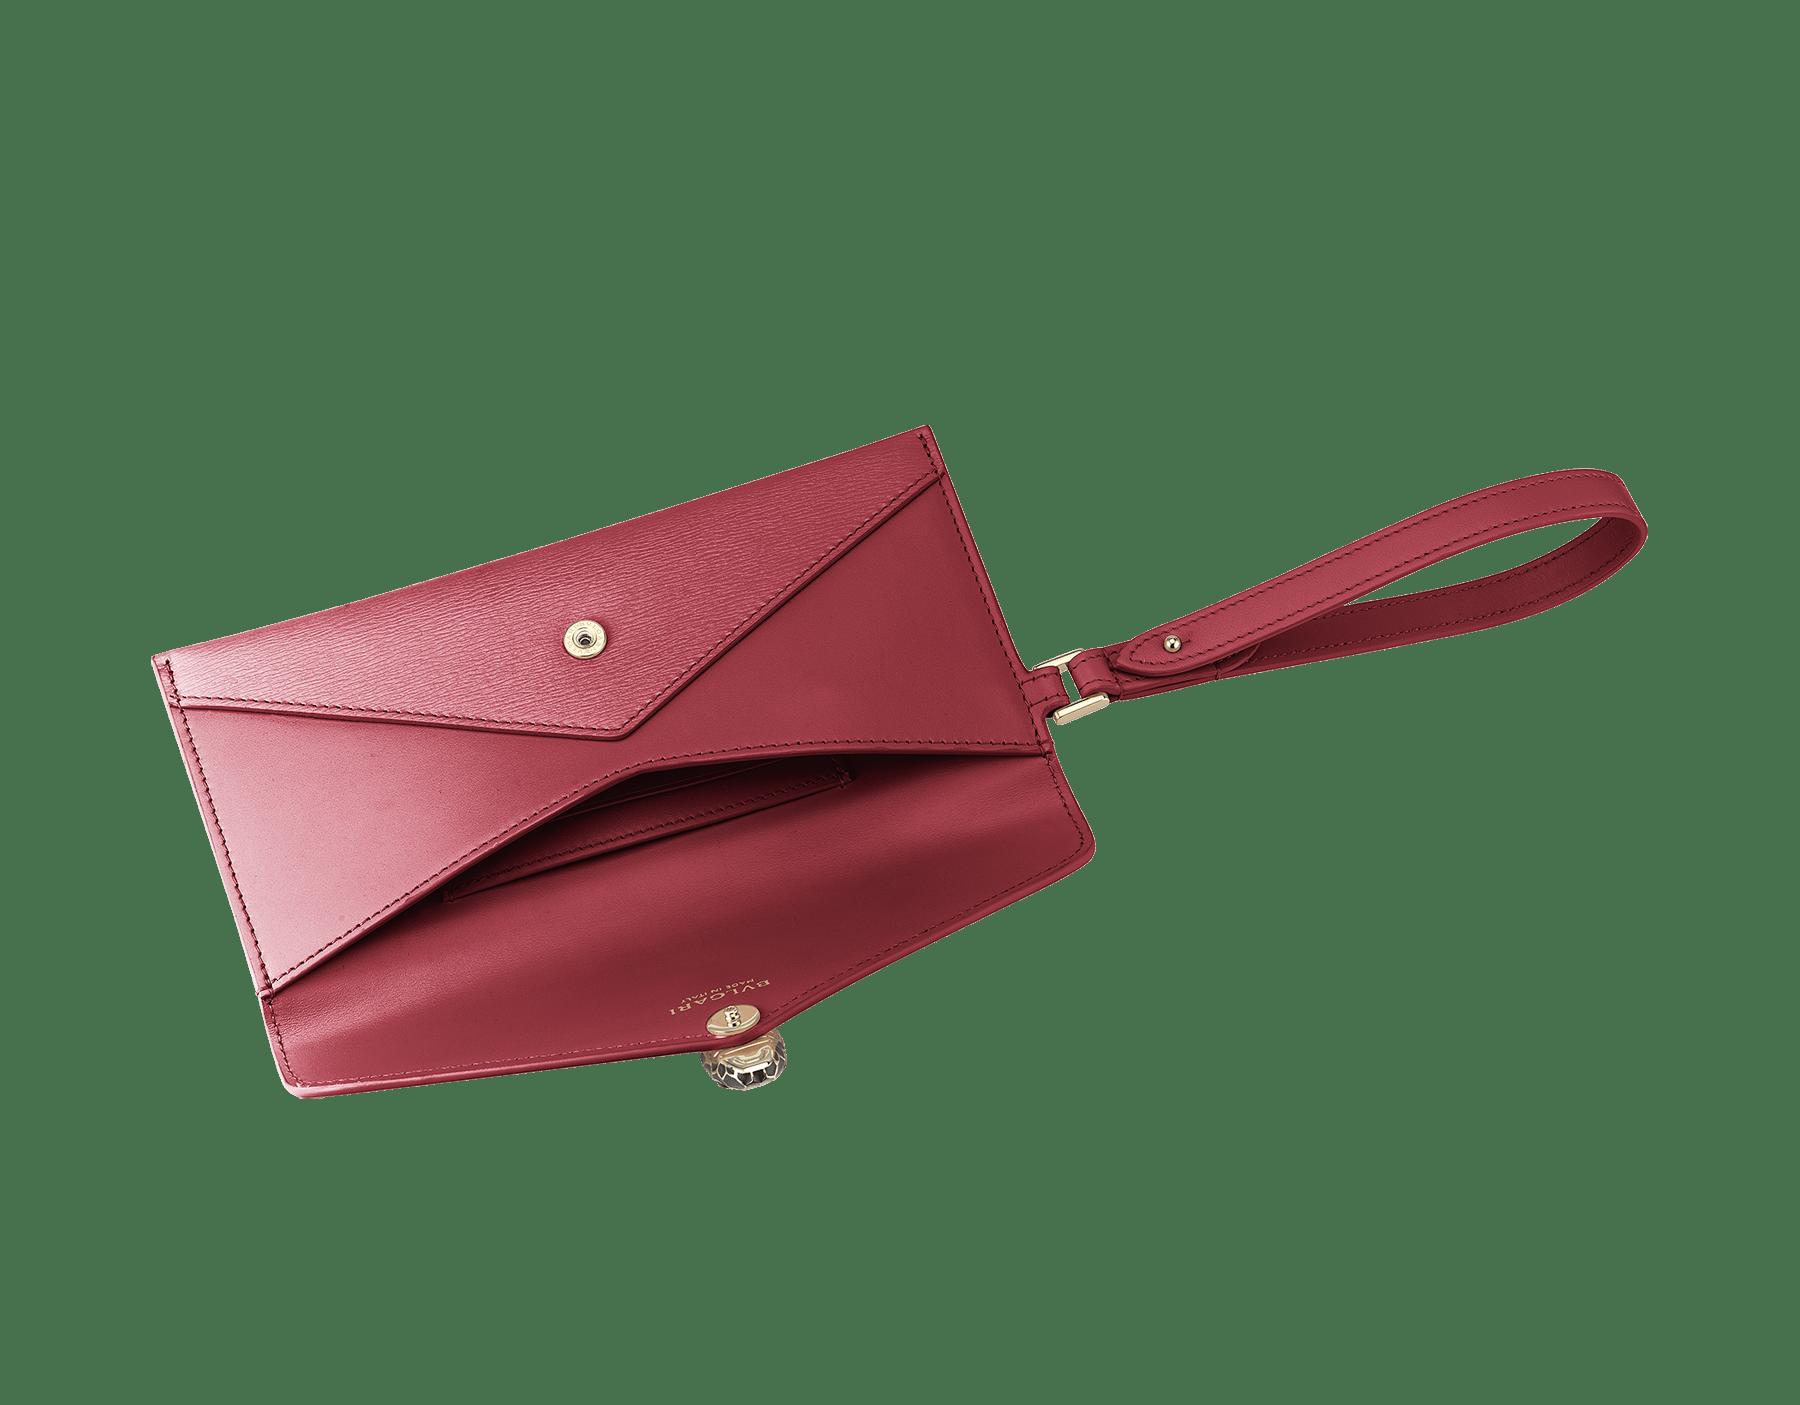 Serpenti Forever envelope case in Roman garnet calf leather and Roman garnet goatskin. Iconic snakehead charm in black and Roman garnet enamel, with black onyx eyes. 289089 image 2